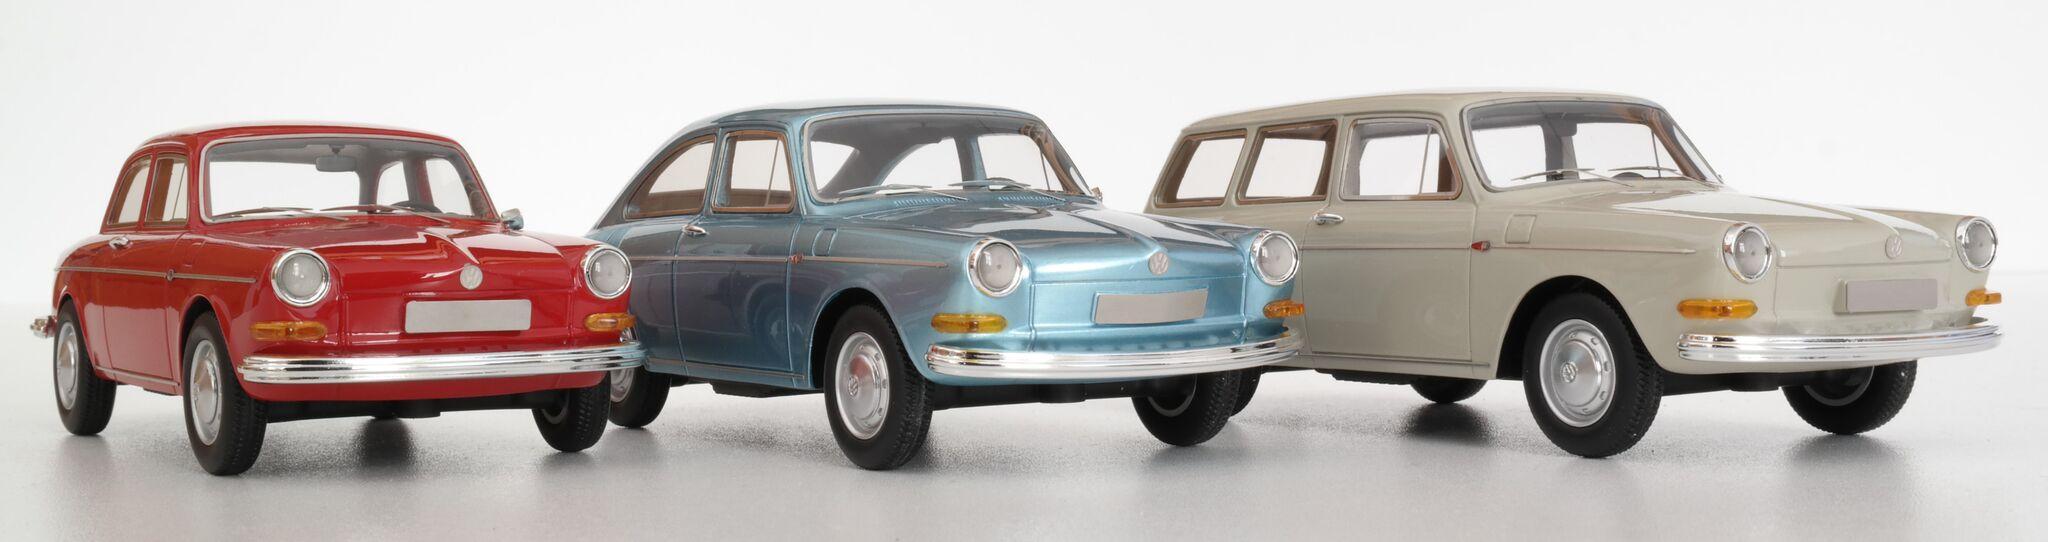 VW 1600 Serie